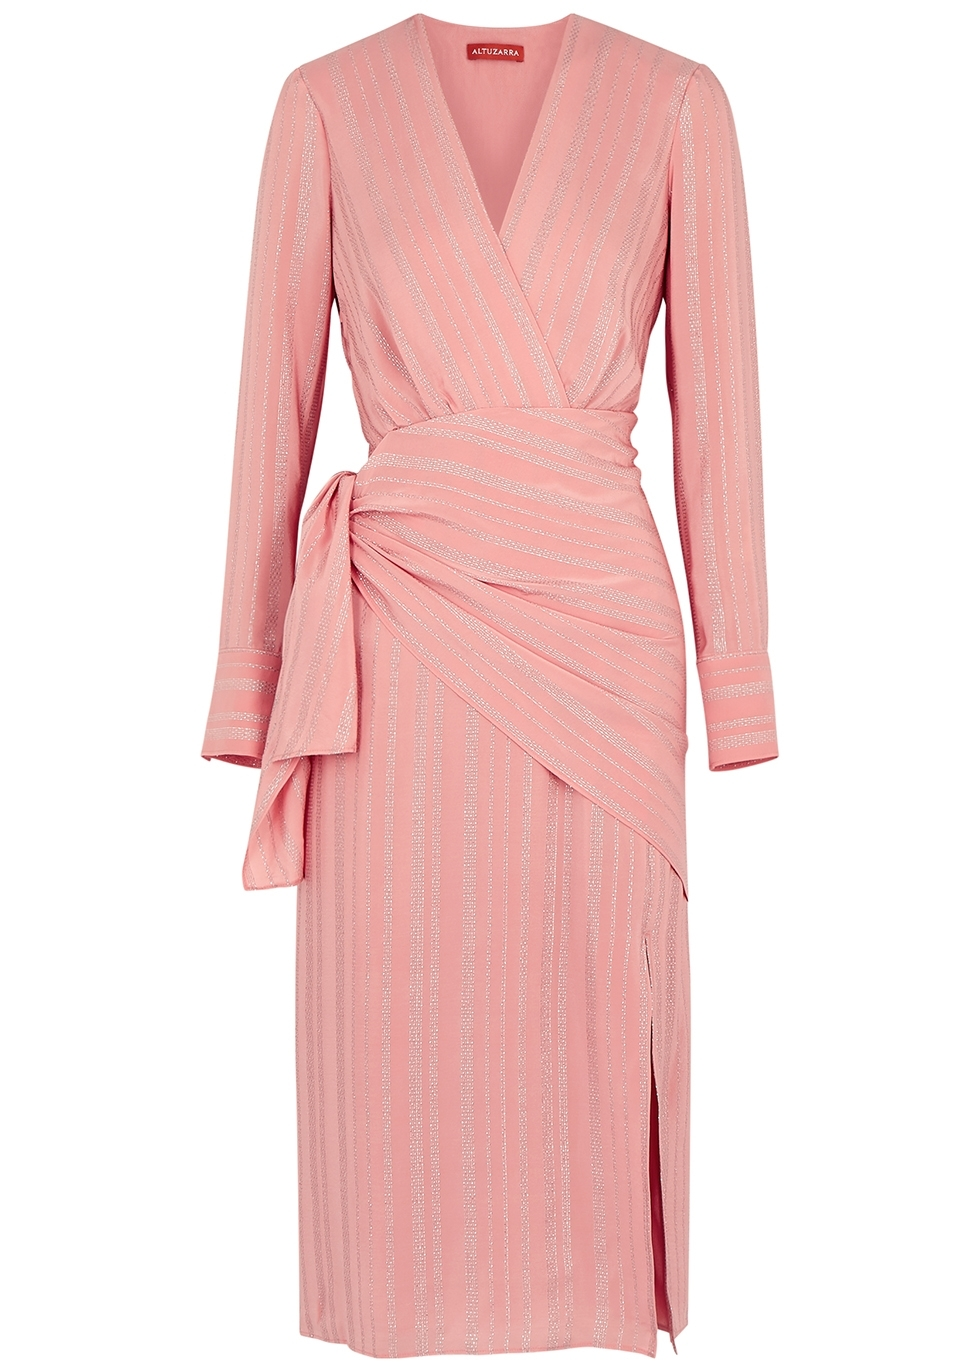 02de0cf5 Designer Dresses & Designer Gowns - Harvey Nichols